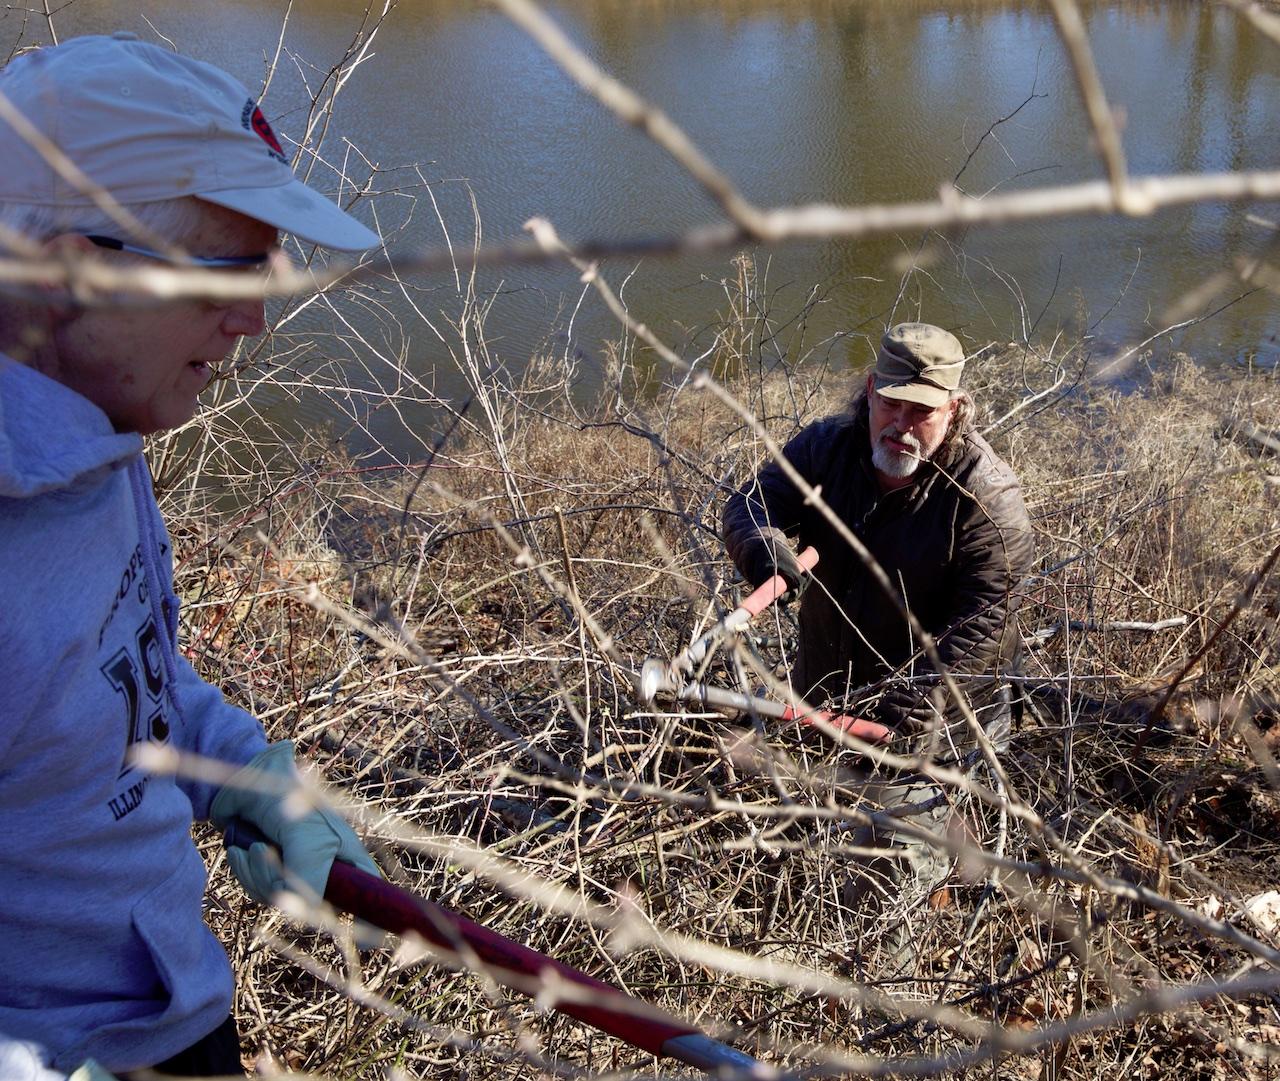 Volunteers on hill, cutting invasive honeysuckle.